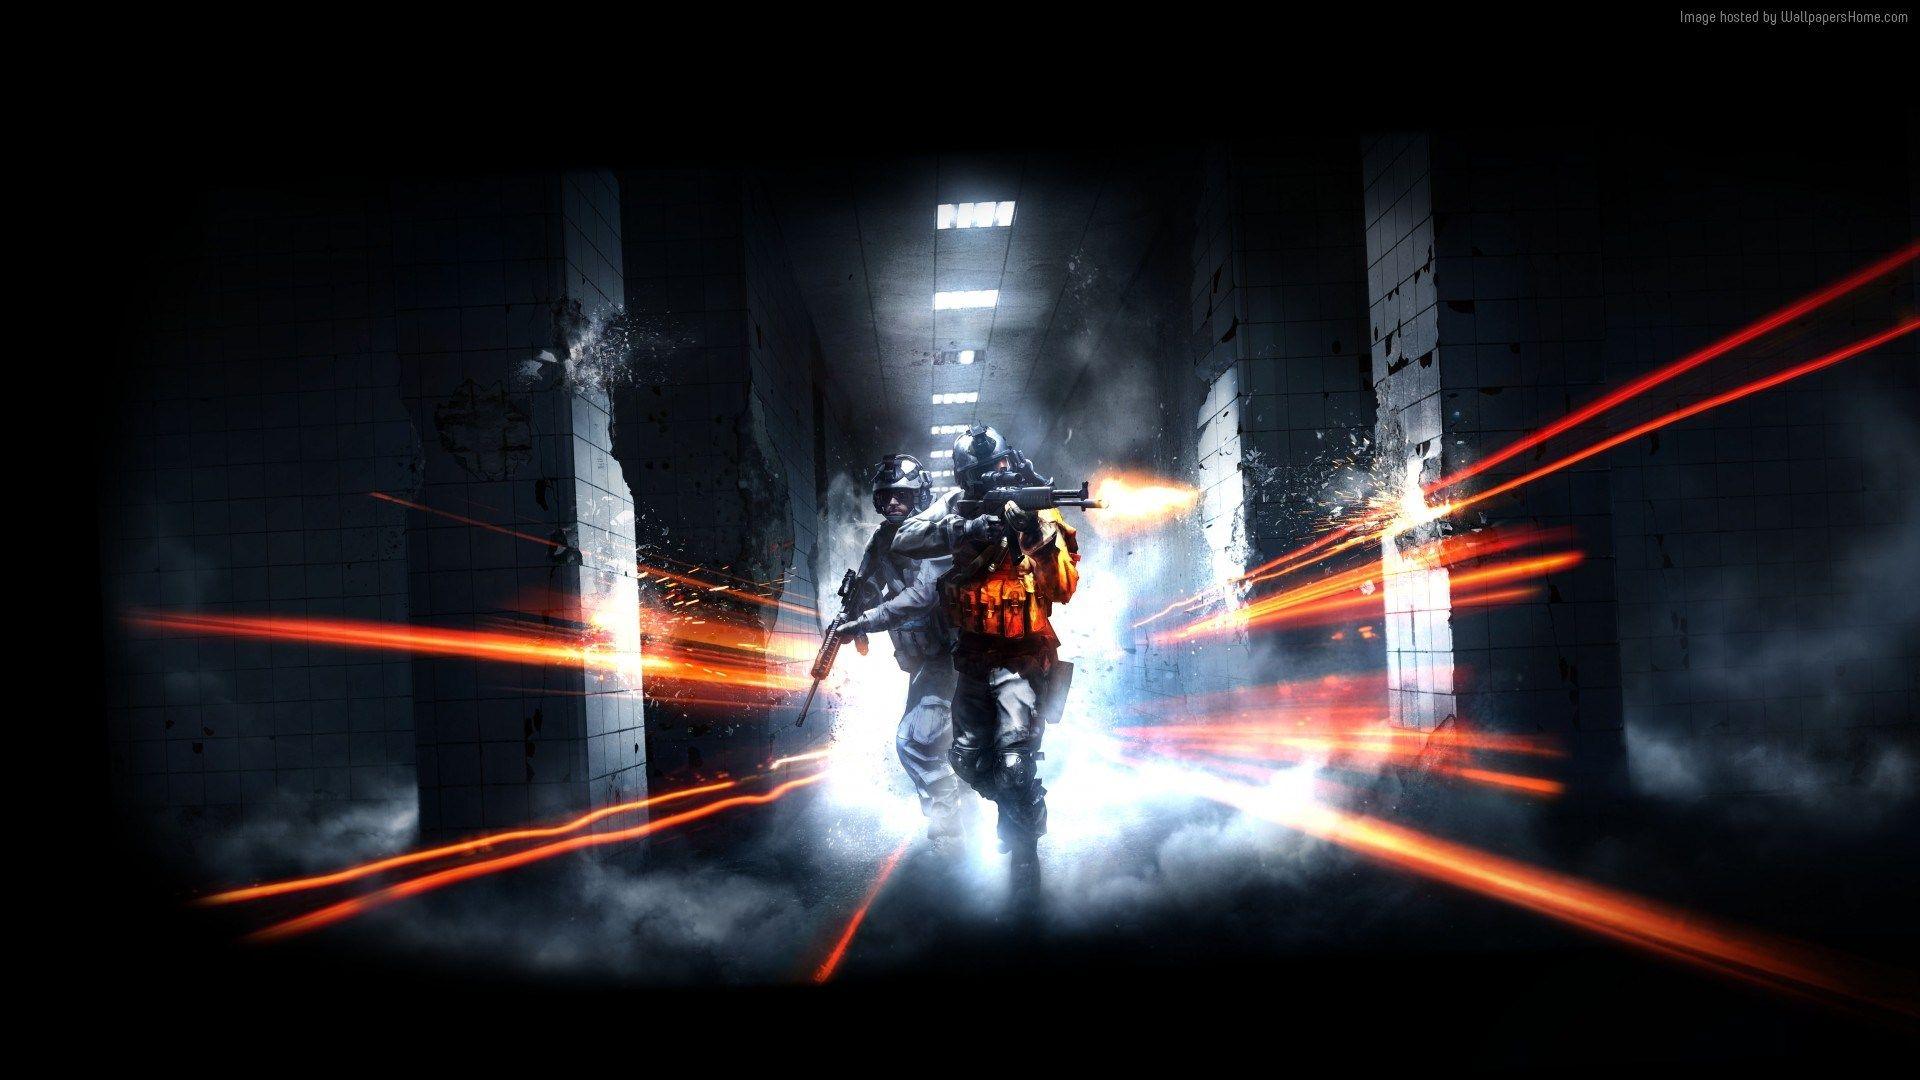 Battlefield Hardline Wallpaper Games Battlefield 3 World Of